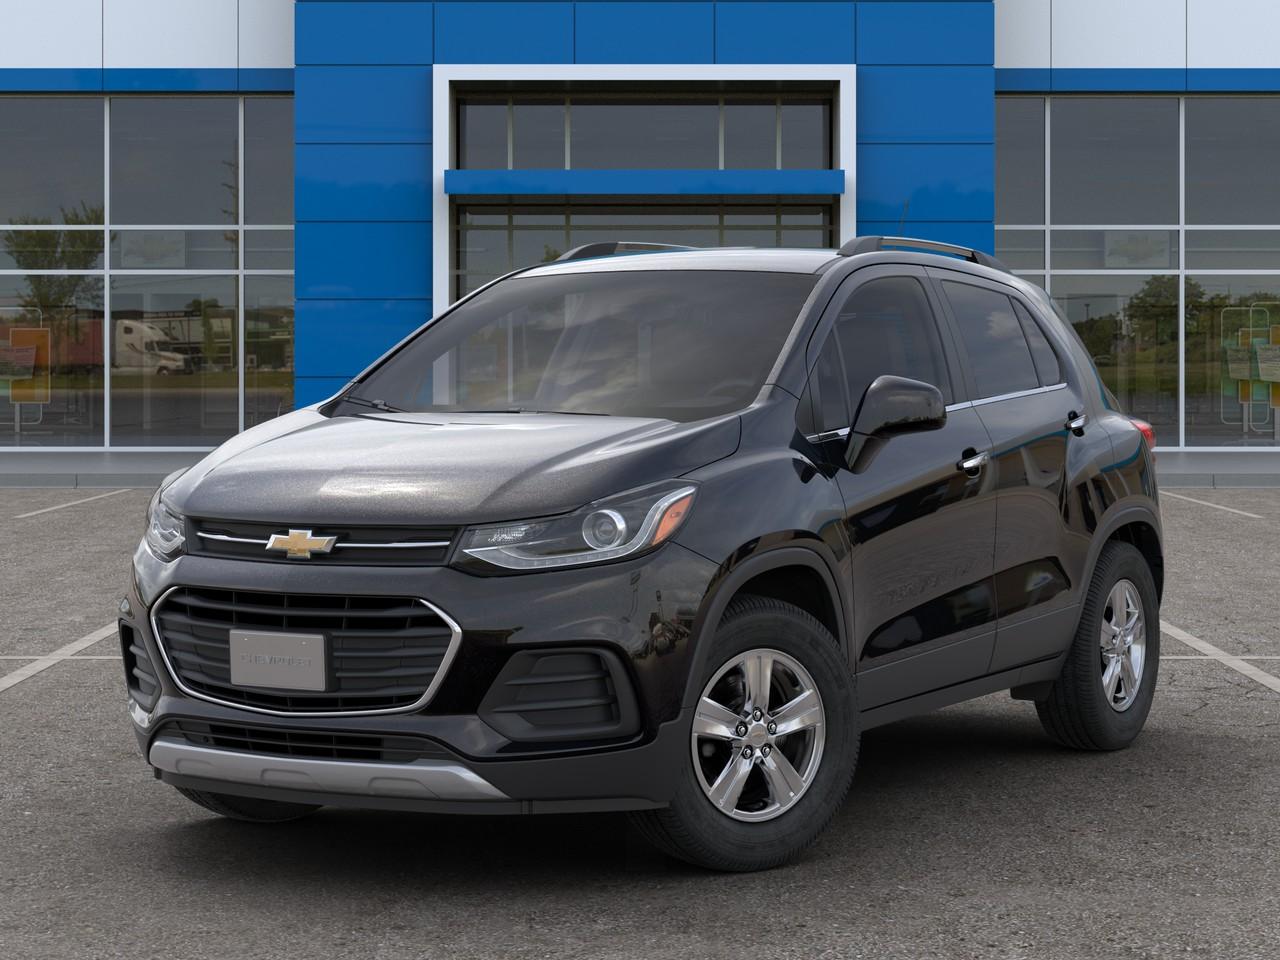 2020 Chevrolet Trax LT SUV